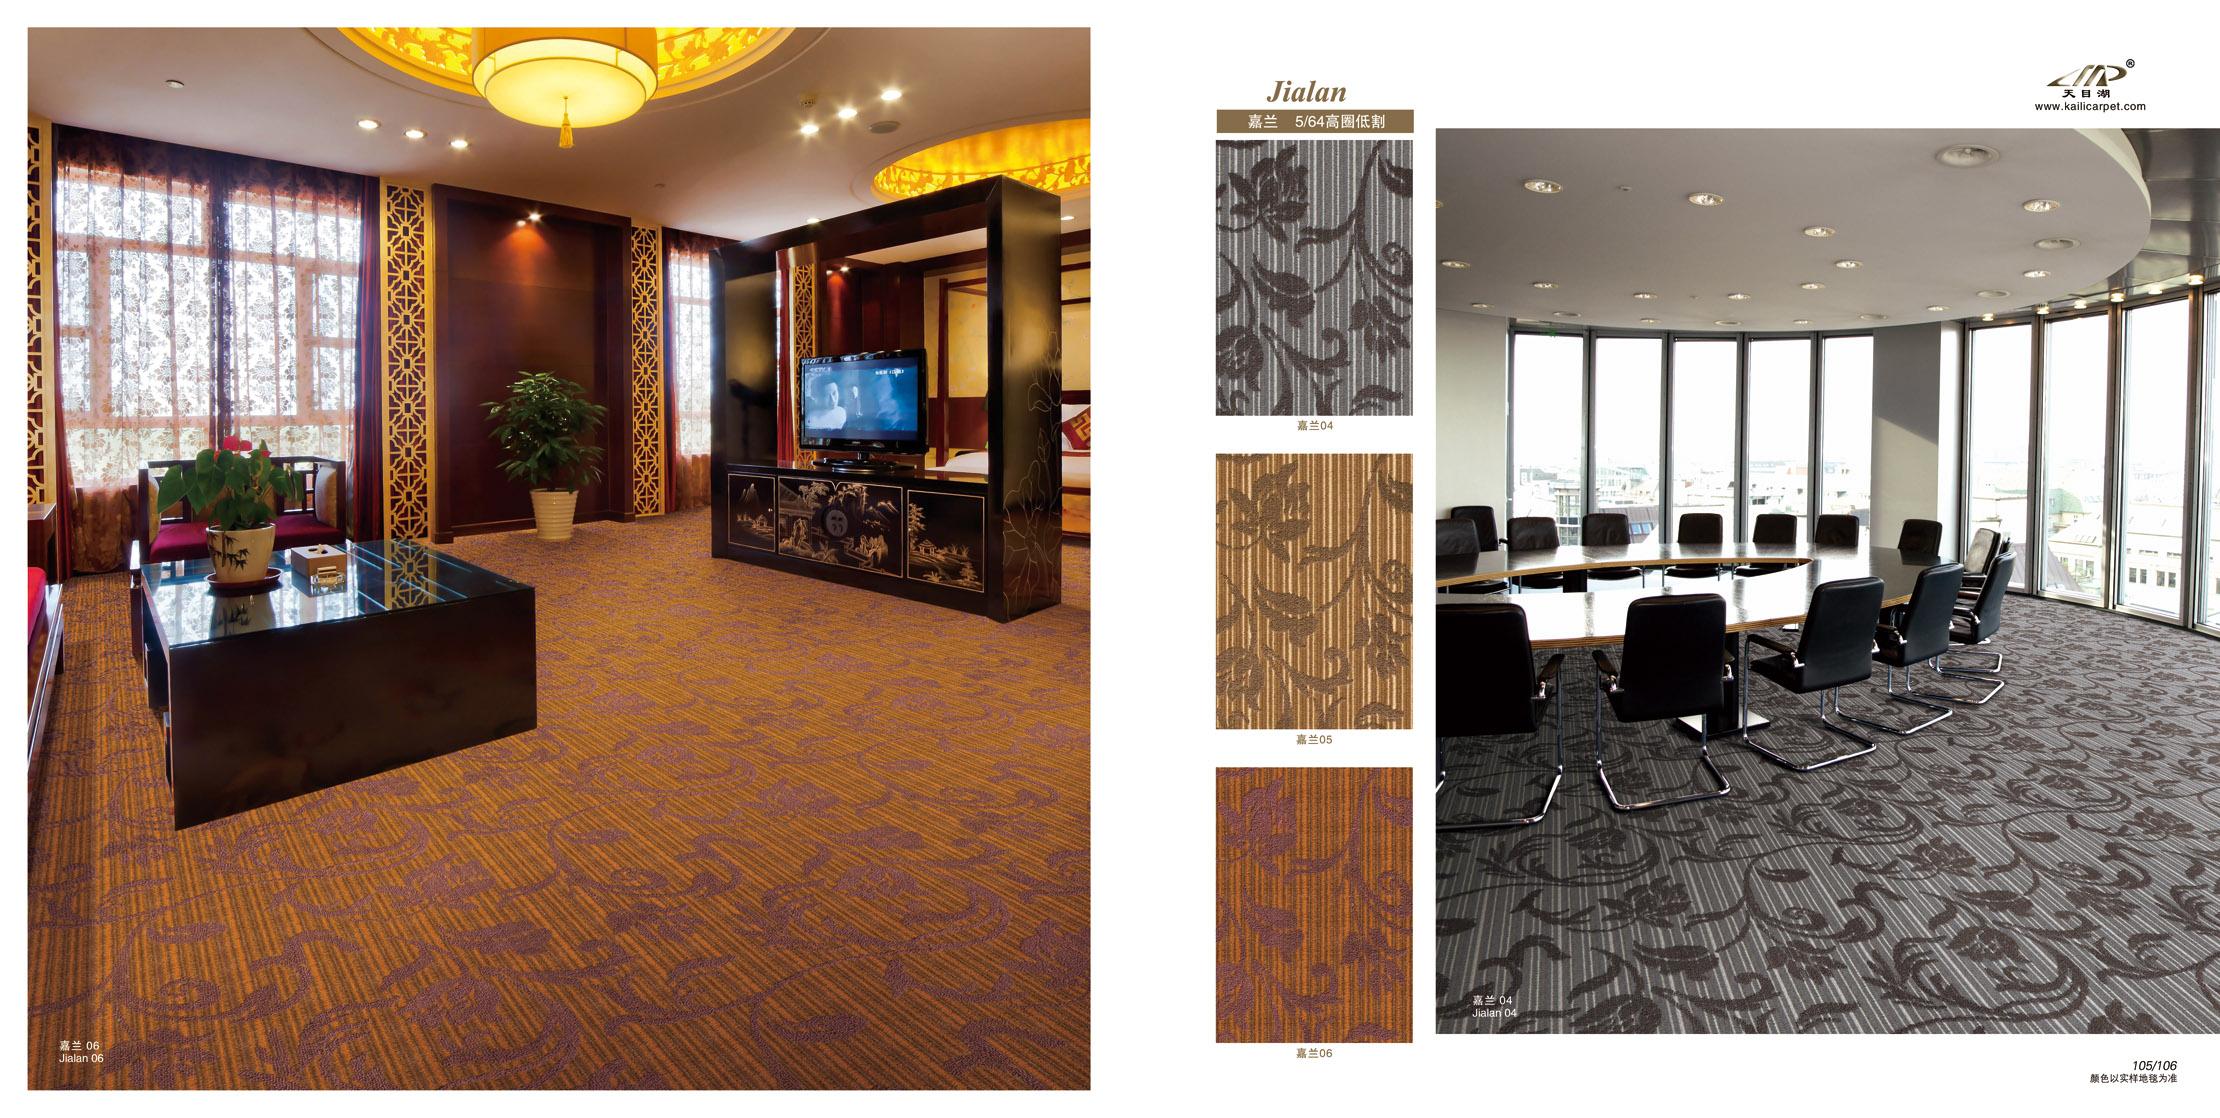 High Quality Machine Tufted Wilton Carpet